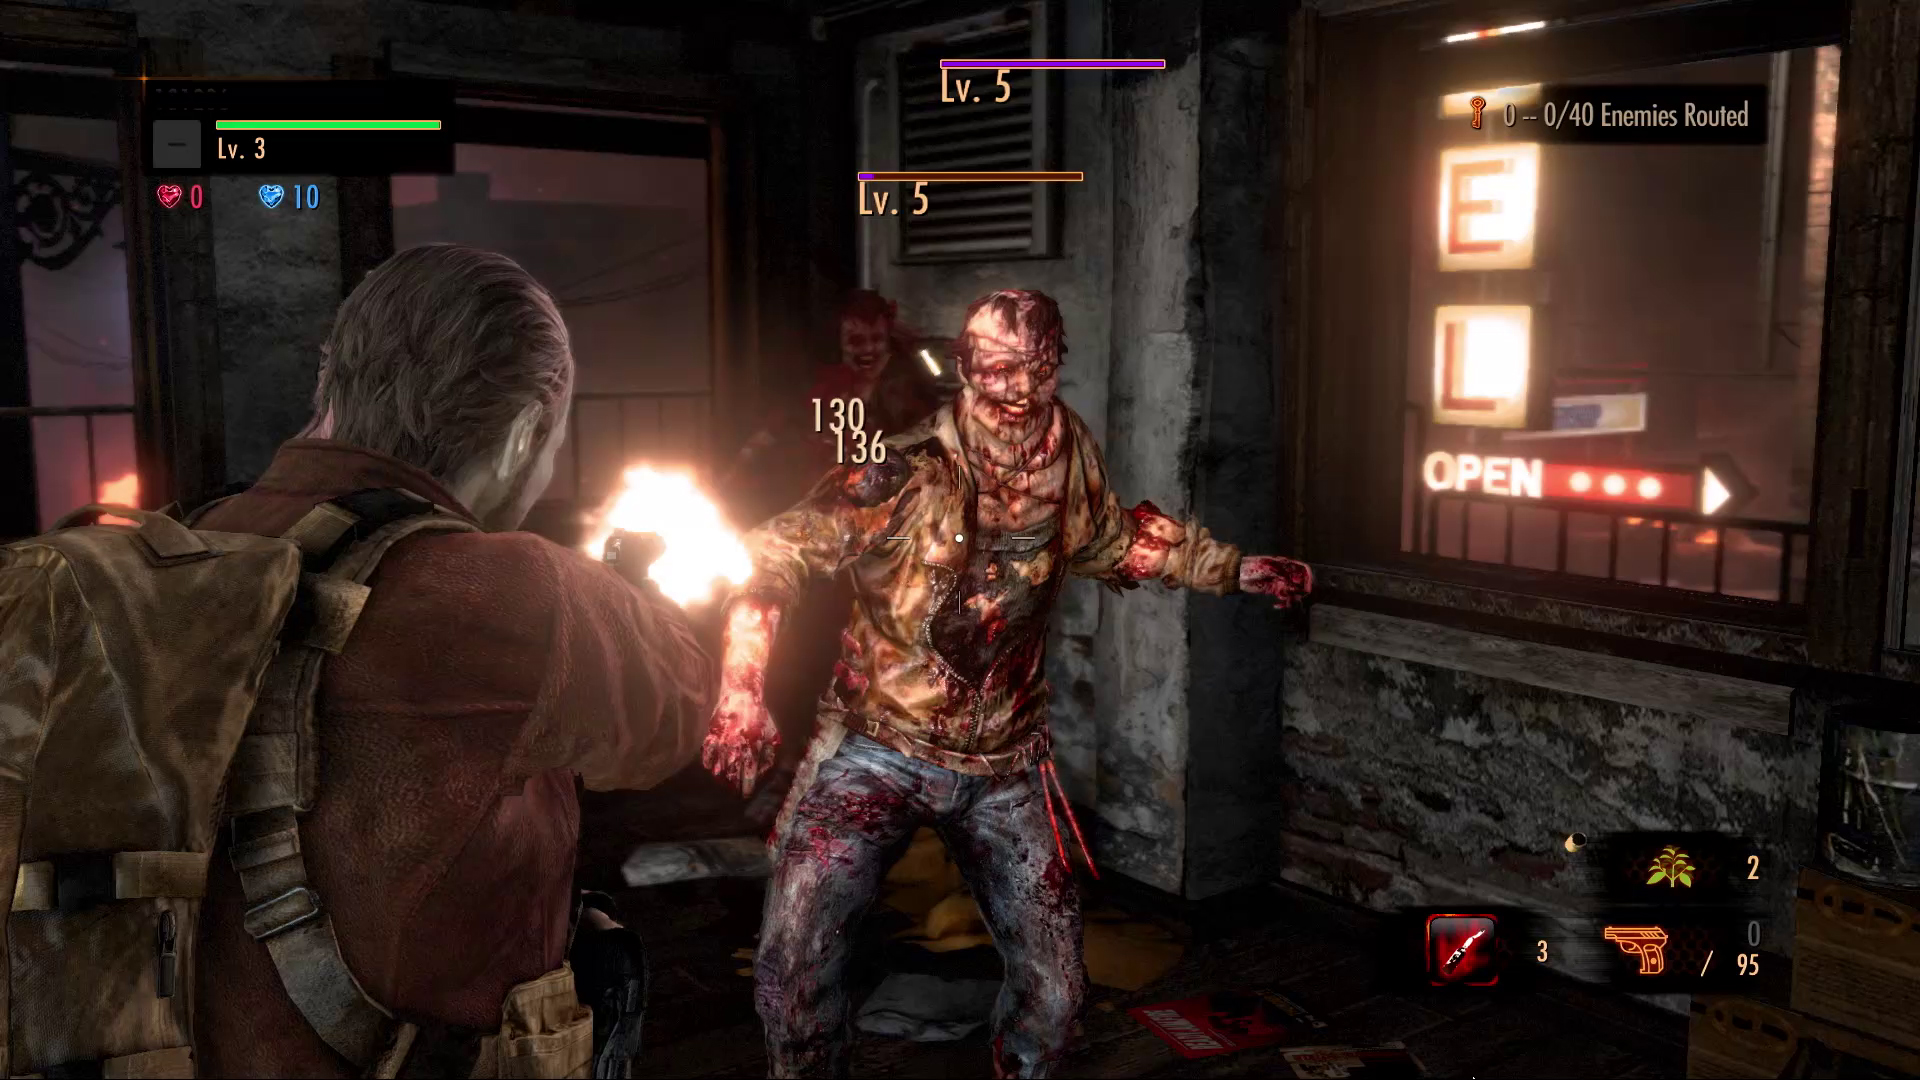 Resident Evil Revelations 2 / Biohazard Revelations 2 Ss_095ef186550e8db0329a4f4010ff0aa426bfc16f